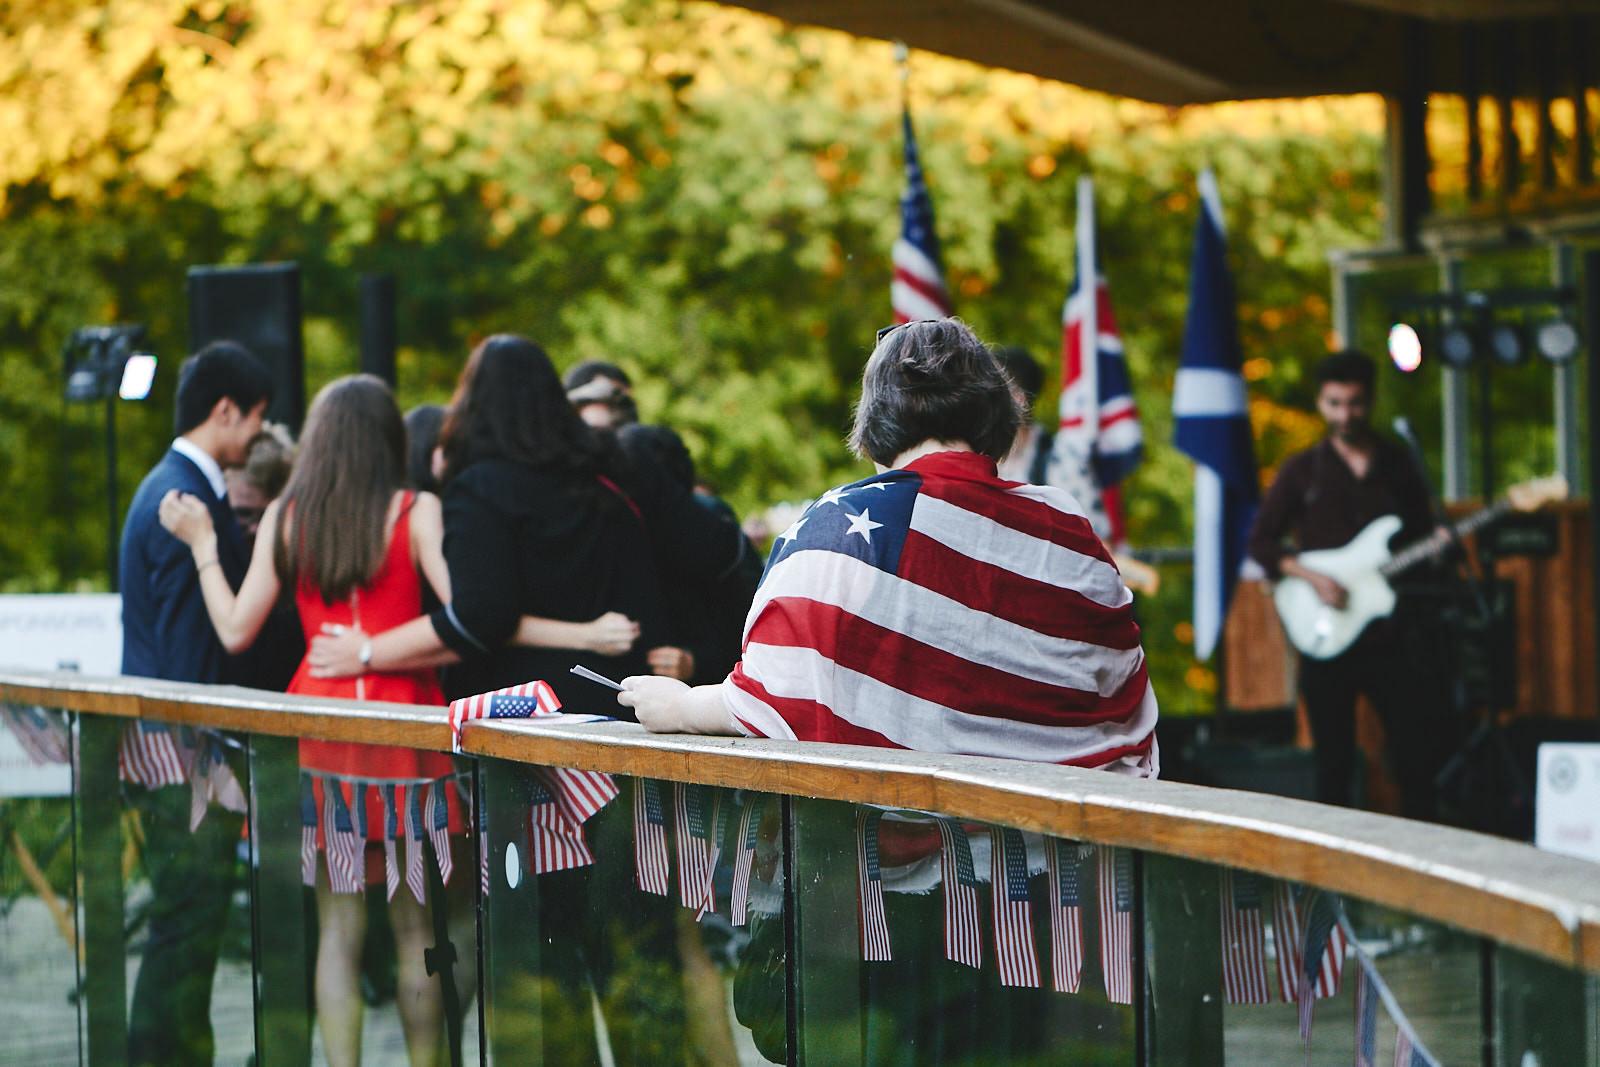 US consulate Edinburgh 4th of July celebration 2018 - 265 web.jpg